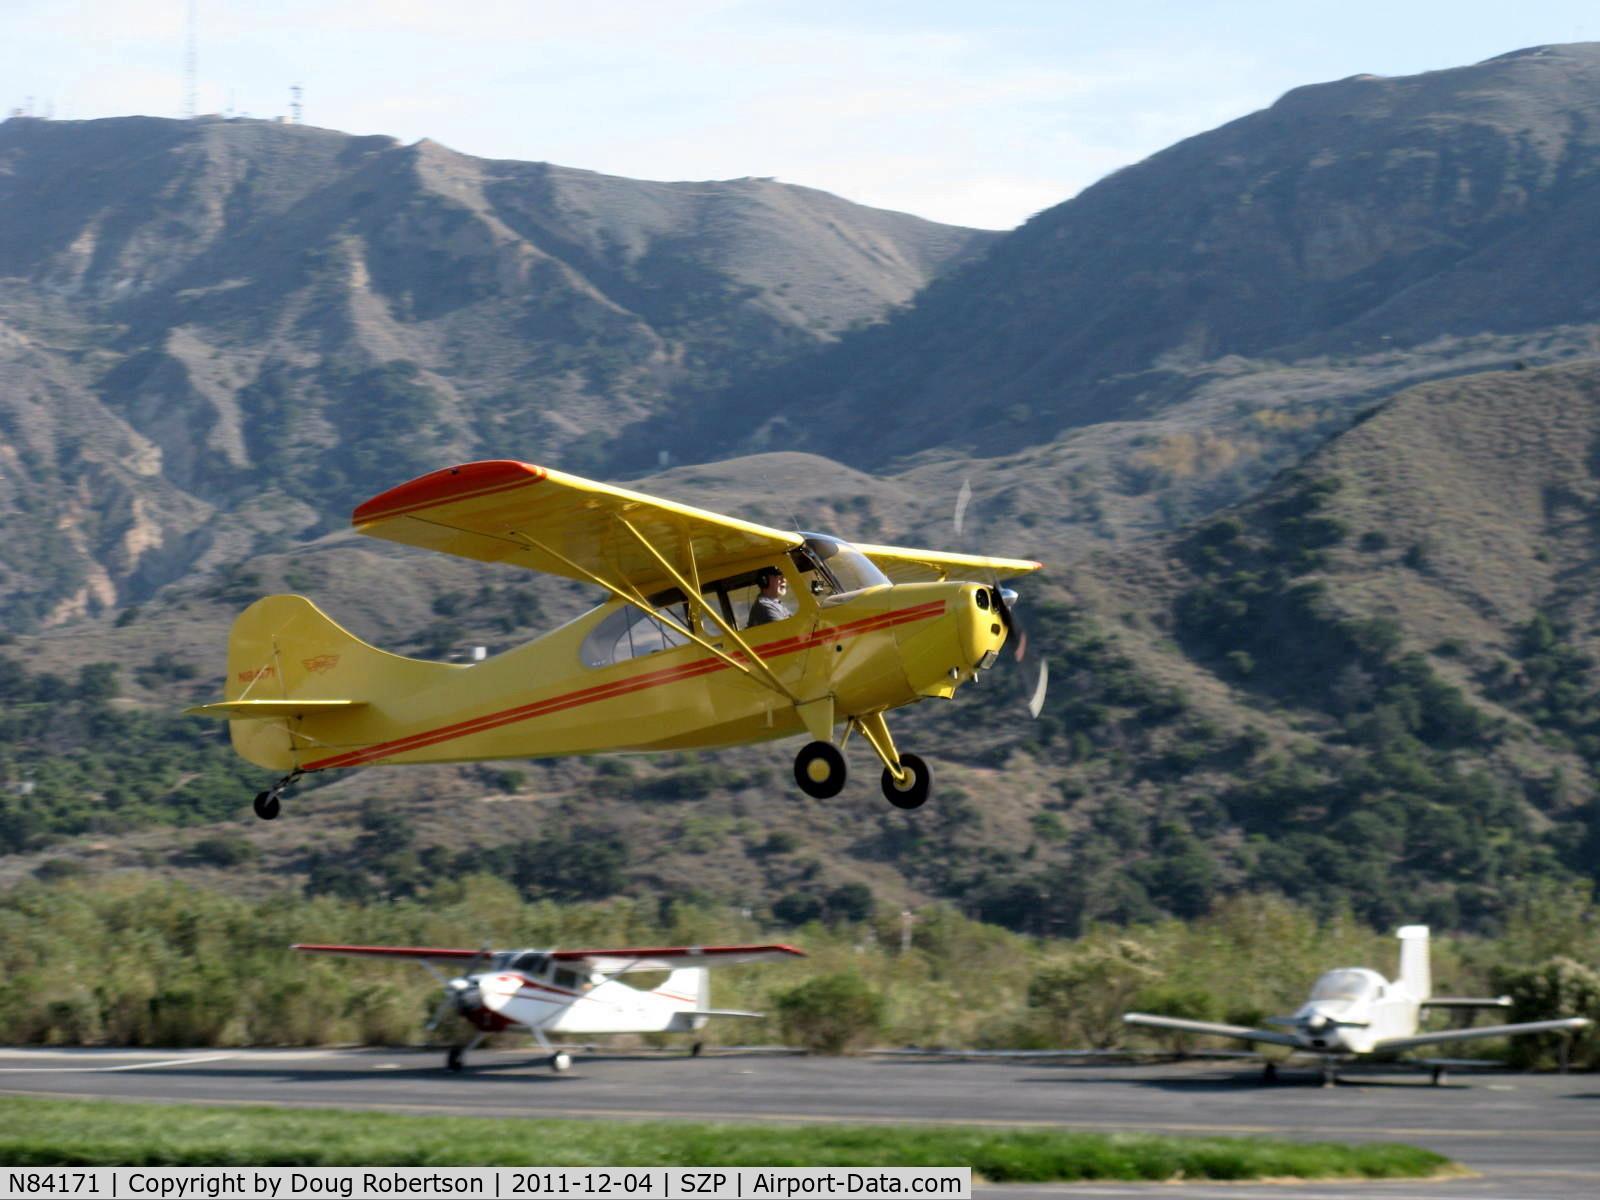 N84171, 1946 Aeronca 7AC Champion C/N 7AC-2859, 1946 Aeronca 7AC CHAMPION, Continental A&C65 65 Hp, takeoff climb Rwy 22